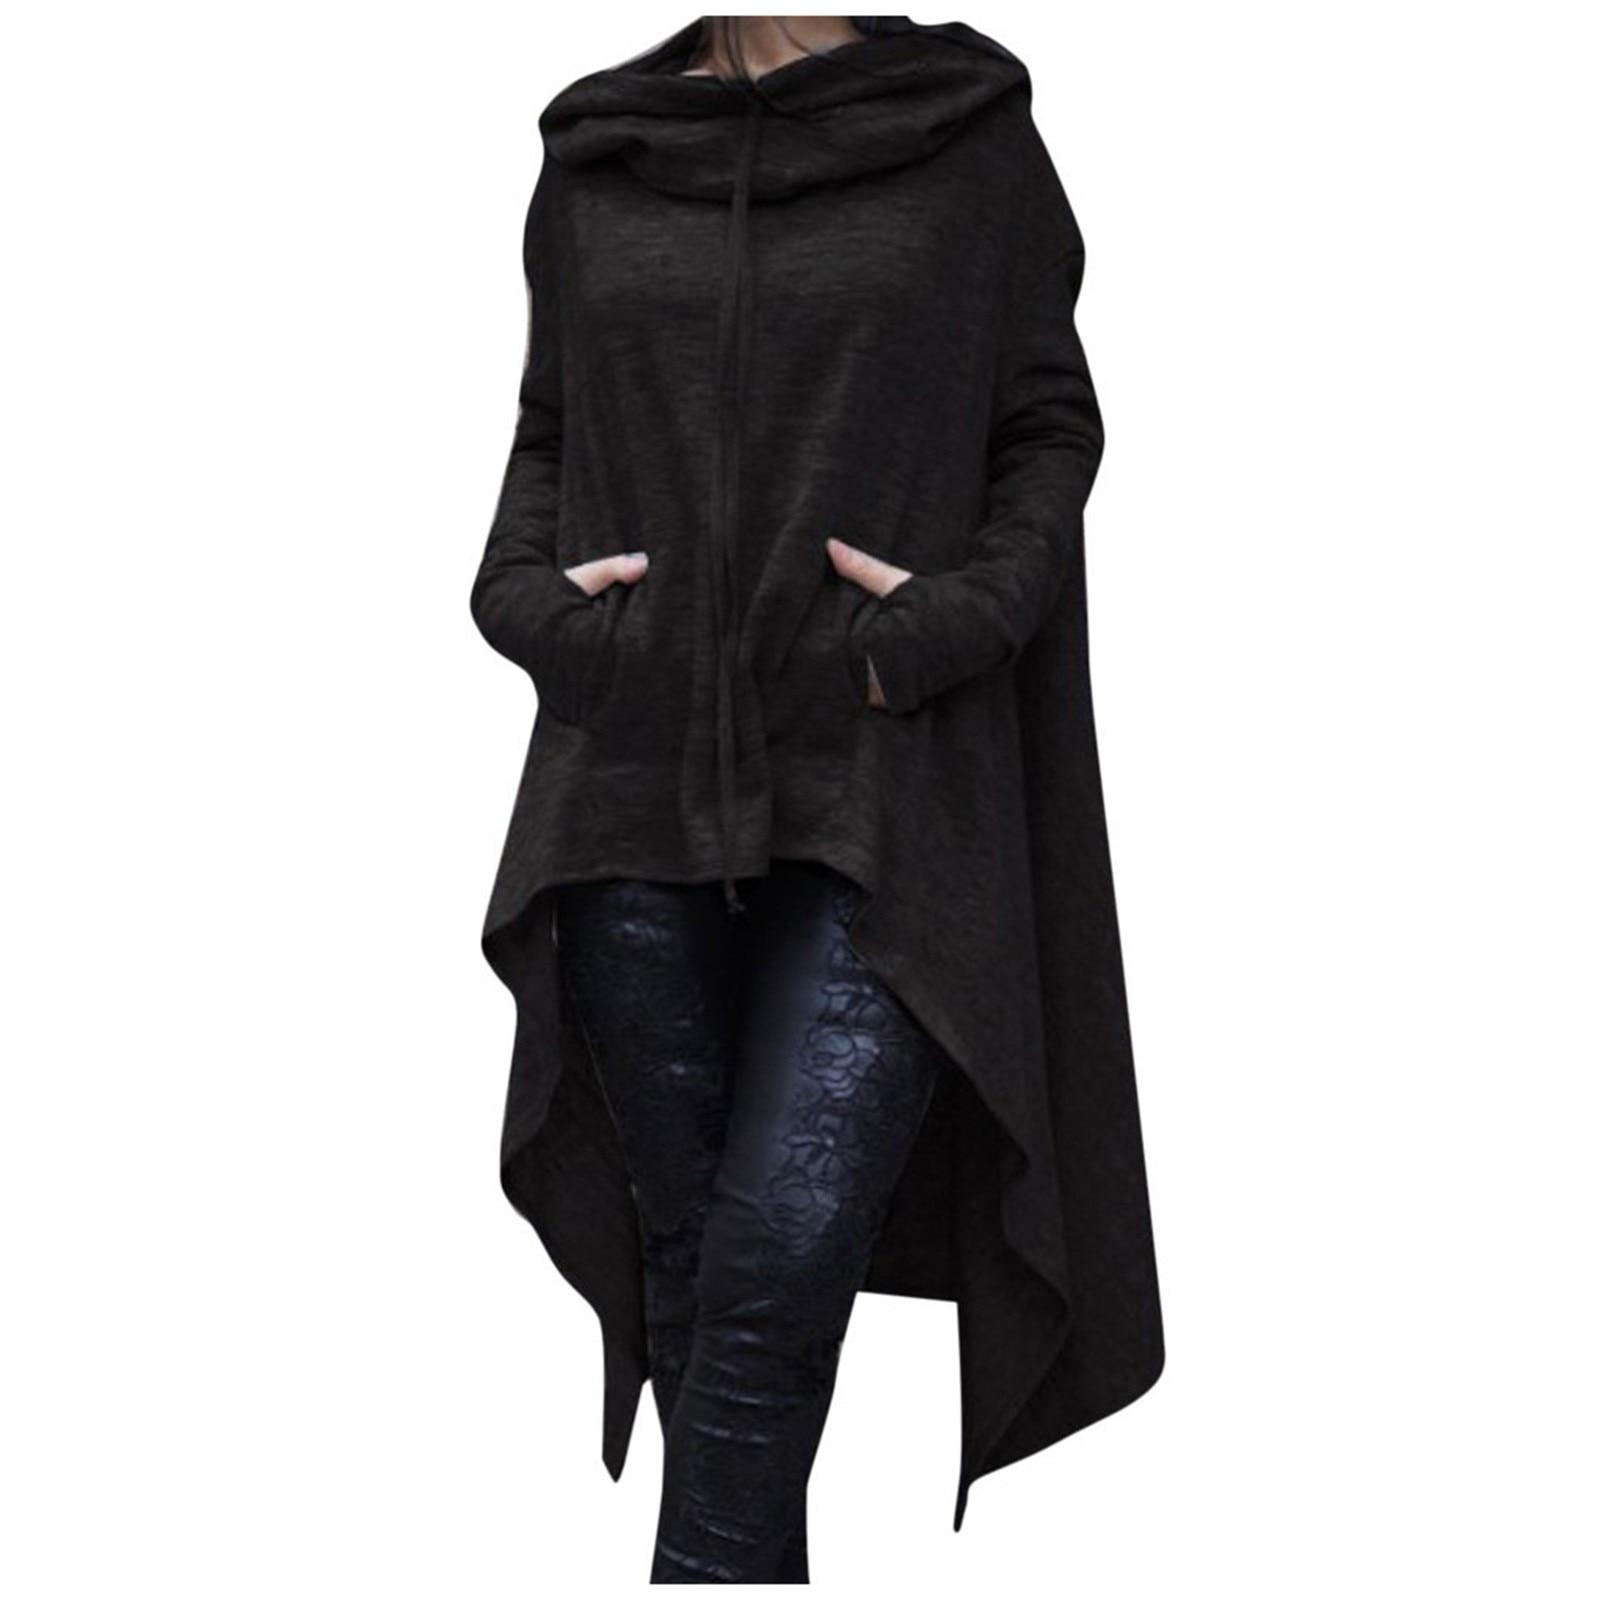 40#Women Plus Size Long Sleeve Hood Tops Solid Sweatshirt Irregular Long Hoodies Autumn Winter Pocket Elegant Pullover Tops